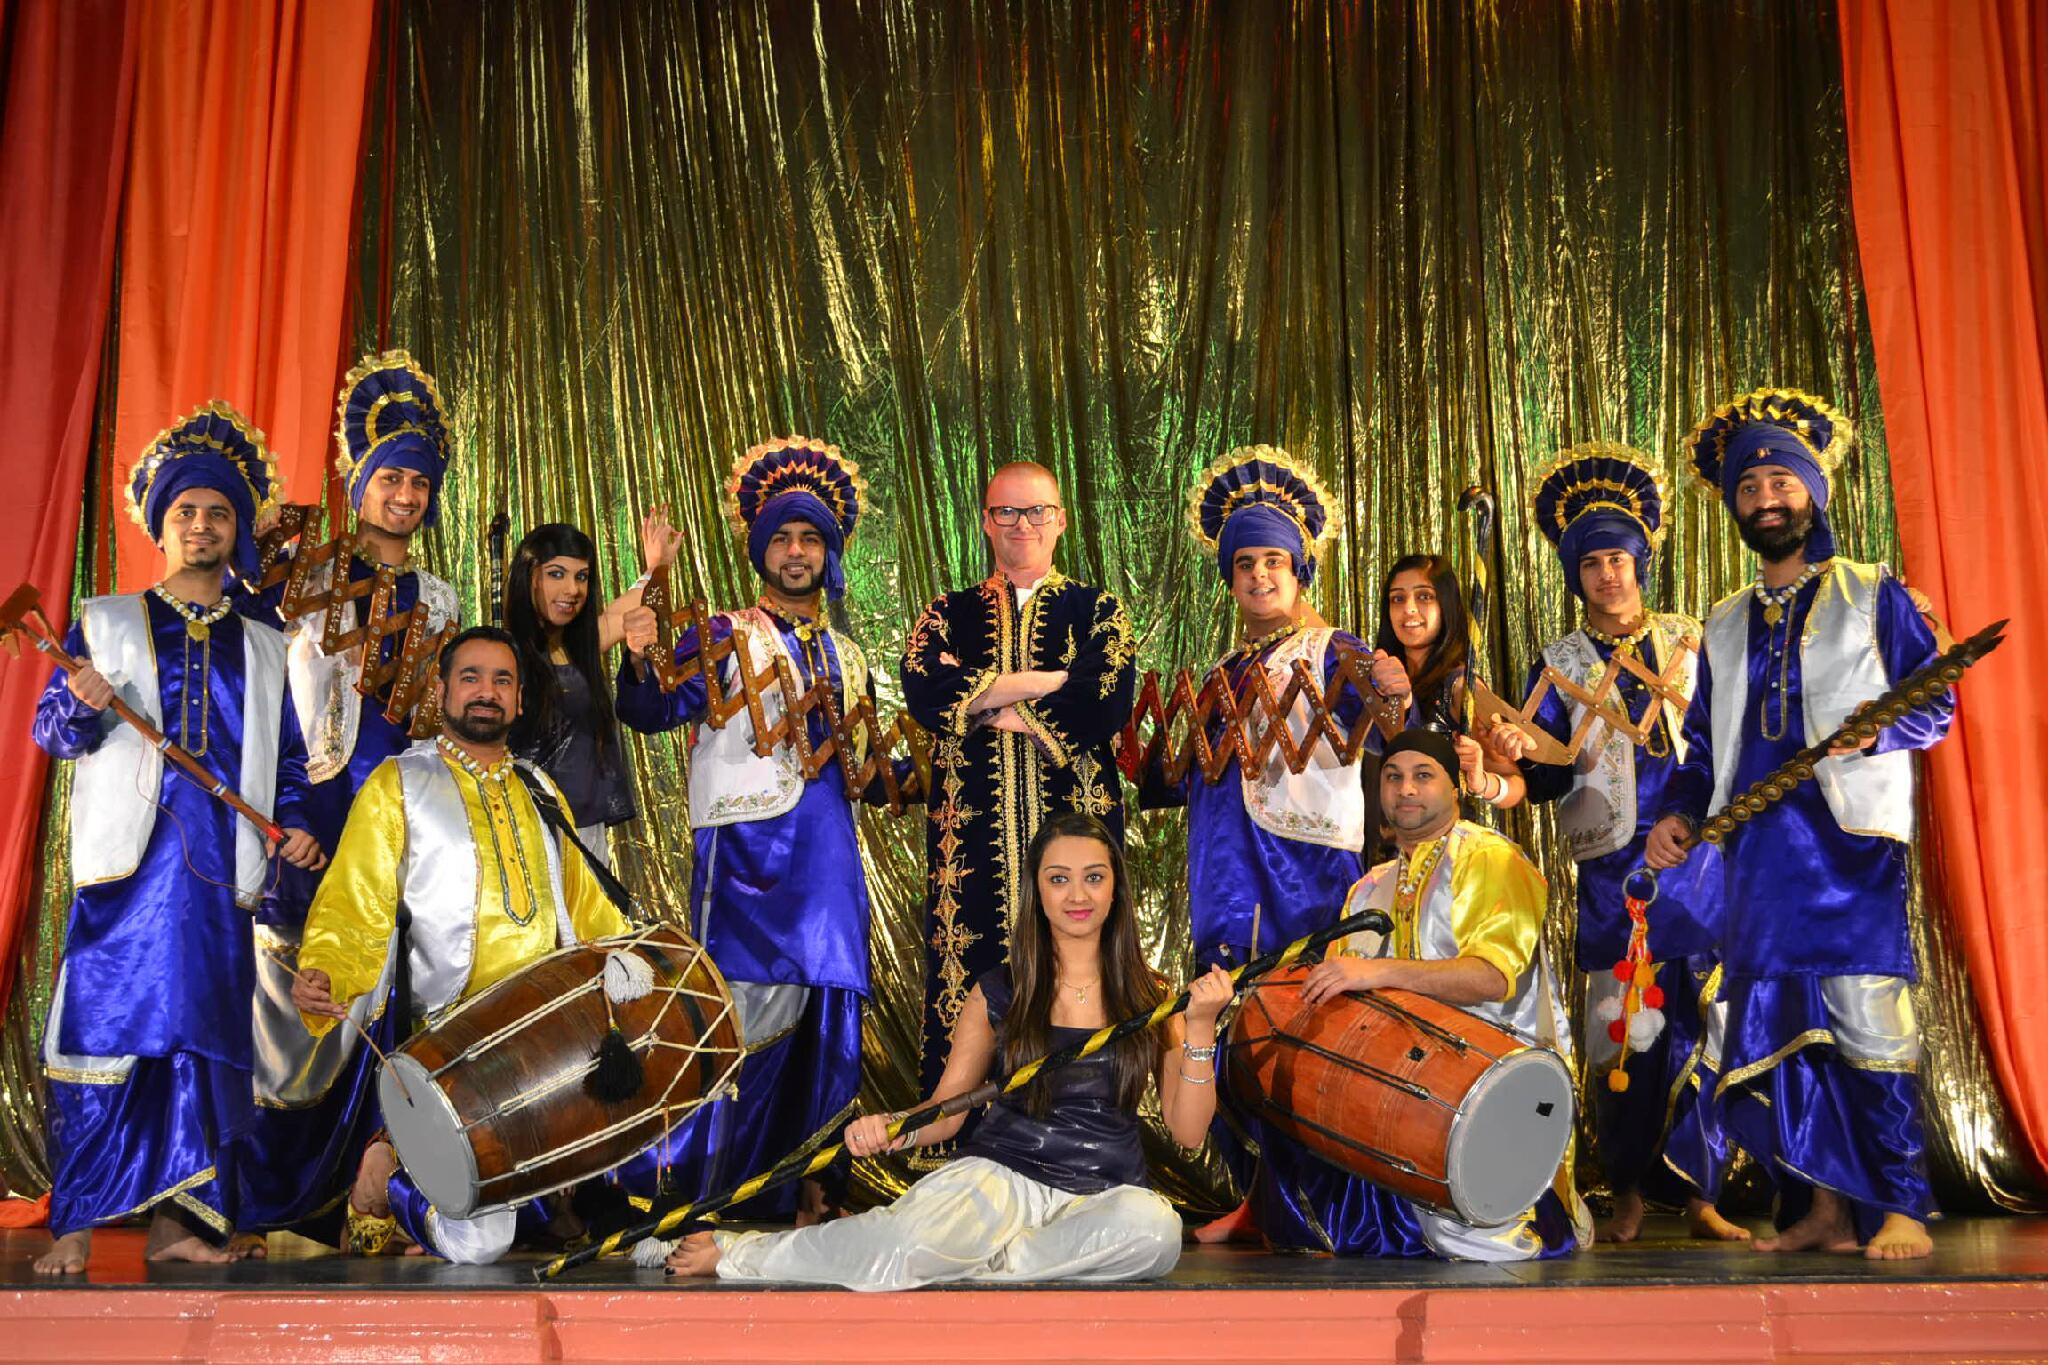 Super Cheff Hestons dancing to Bhangra - Moorni Panjabi MC